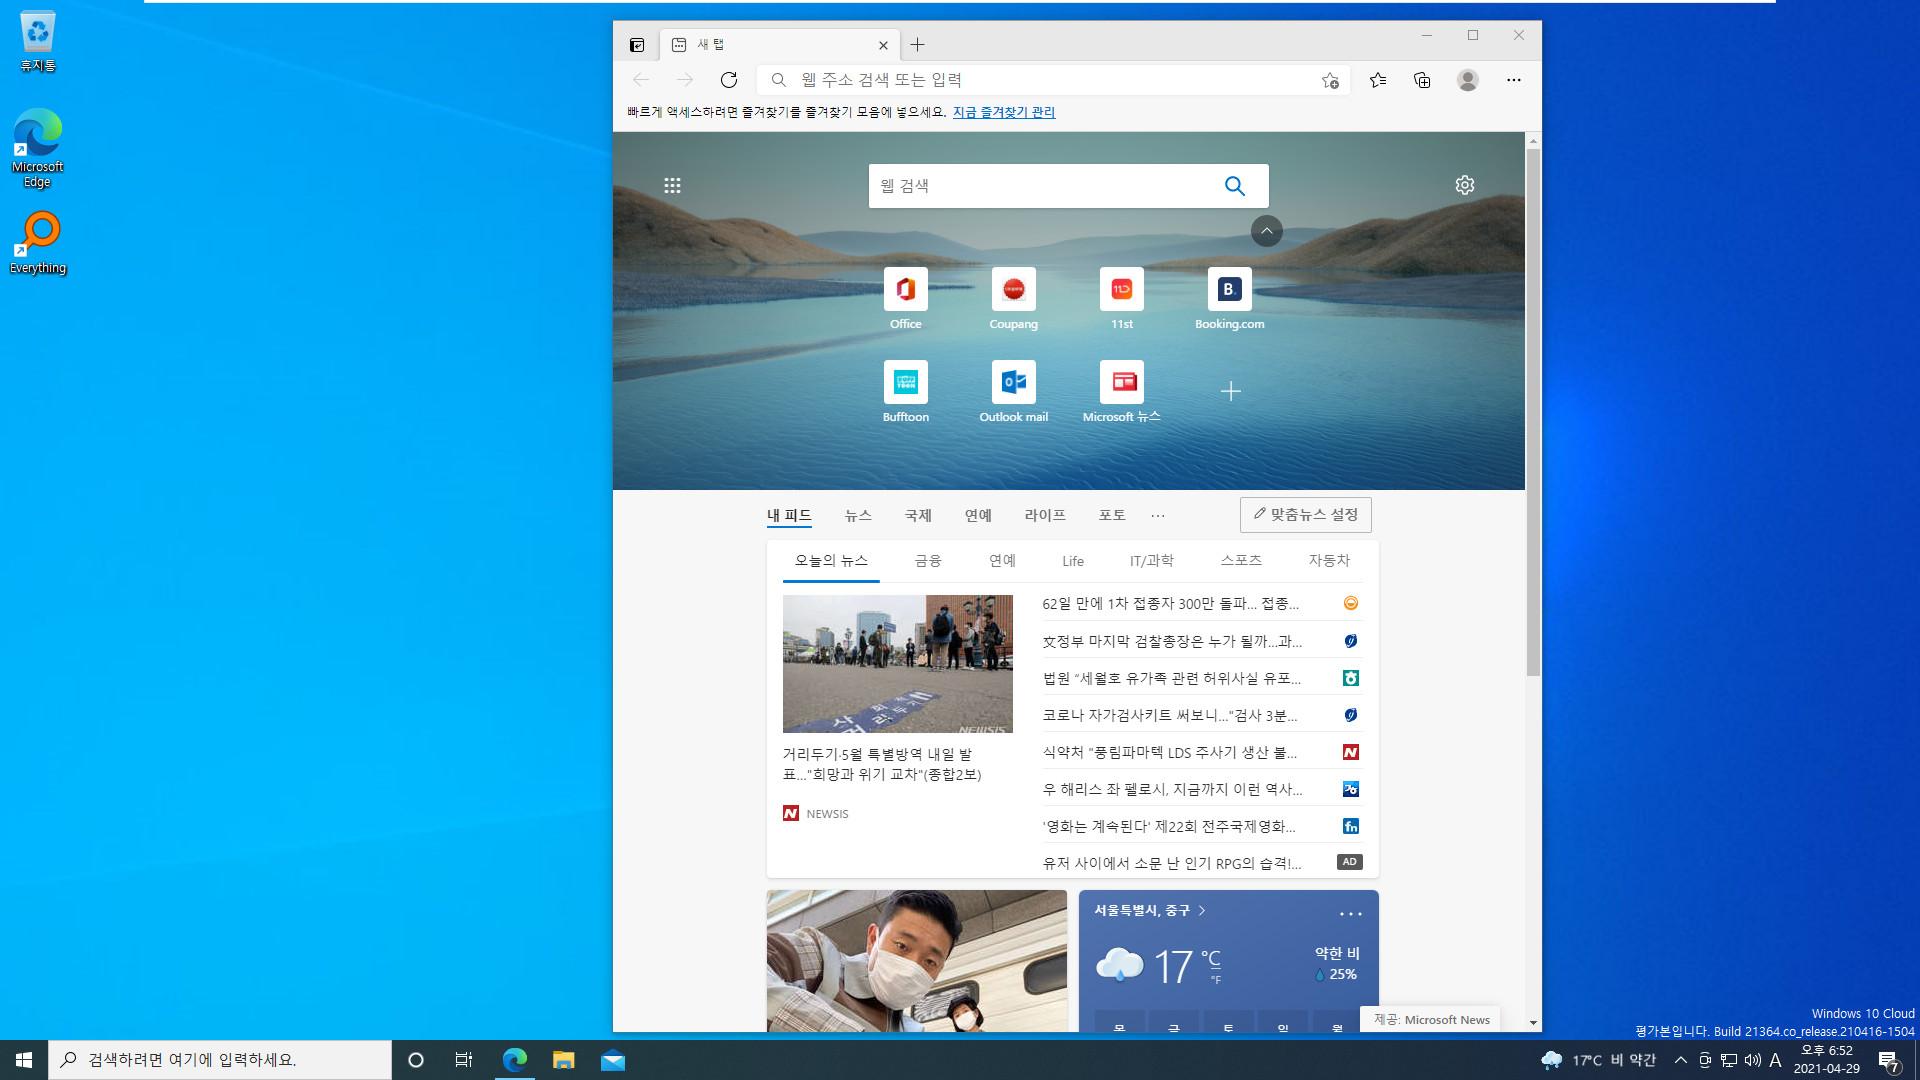 Windows 10 인사이더 프리뷰 버전 Dev (버전 21H2 예상) 21364 빌드에 Cloud Edition 설치 + Pro와 전환 테스트 = 잘 전환됩니다 2021-04-29_185238.jpg